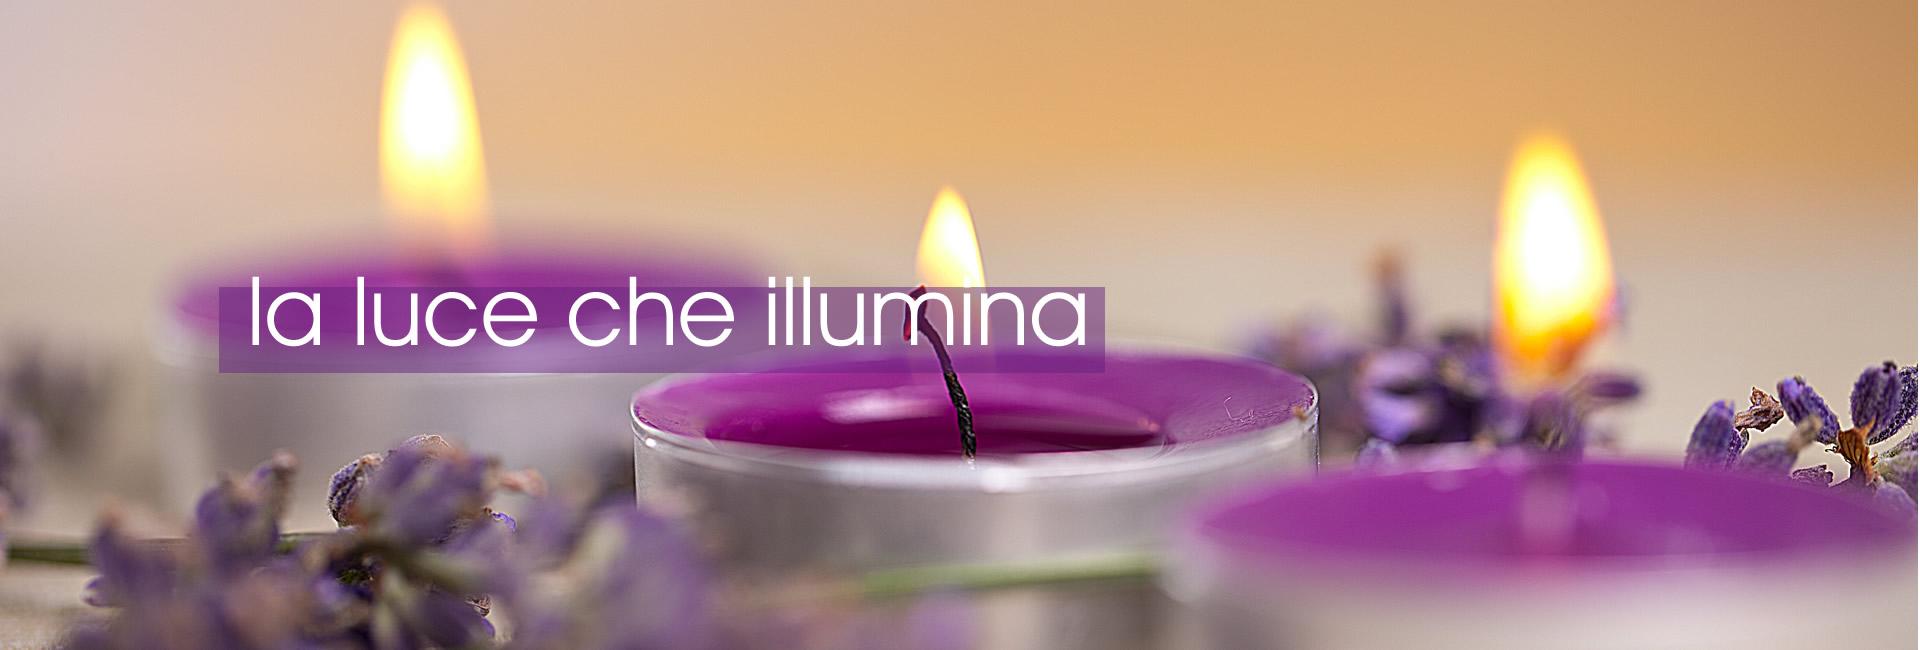 Associazione Ananda Yoga - Nichelino (TO)